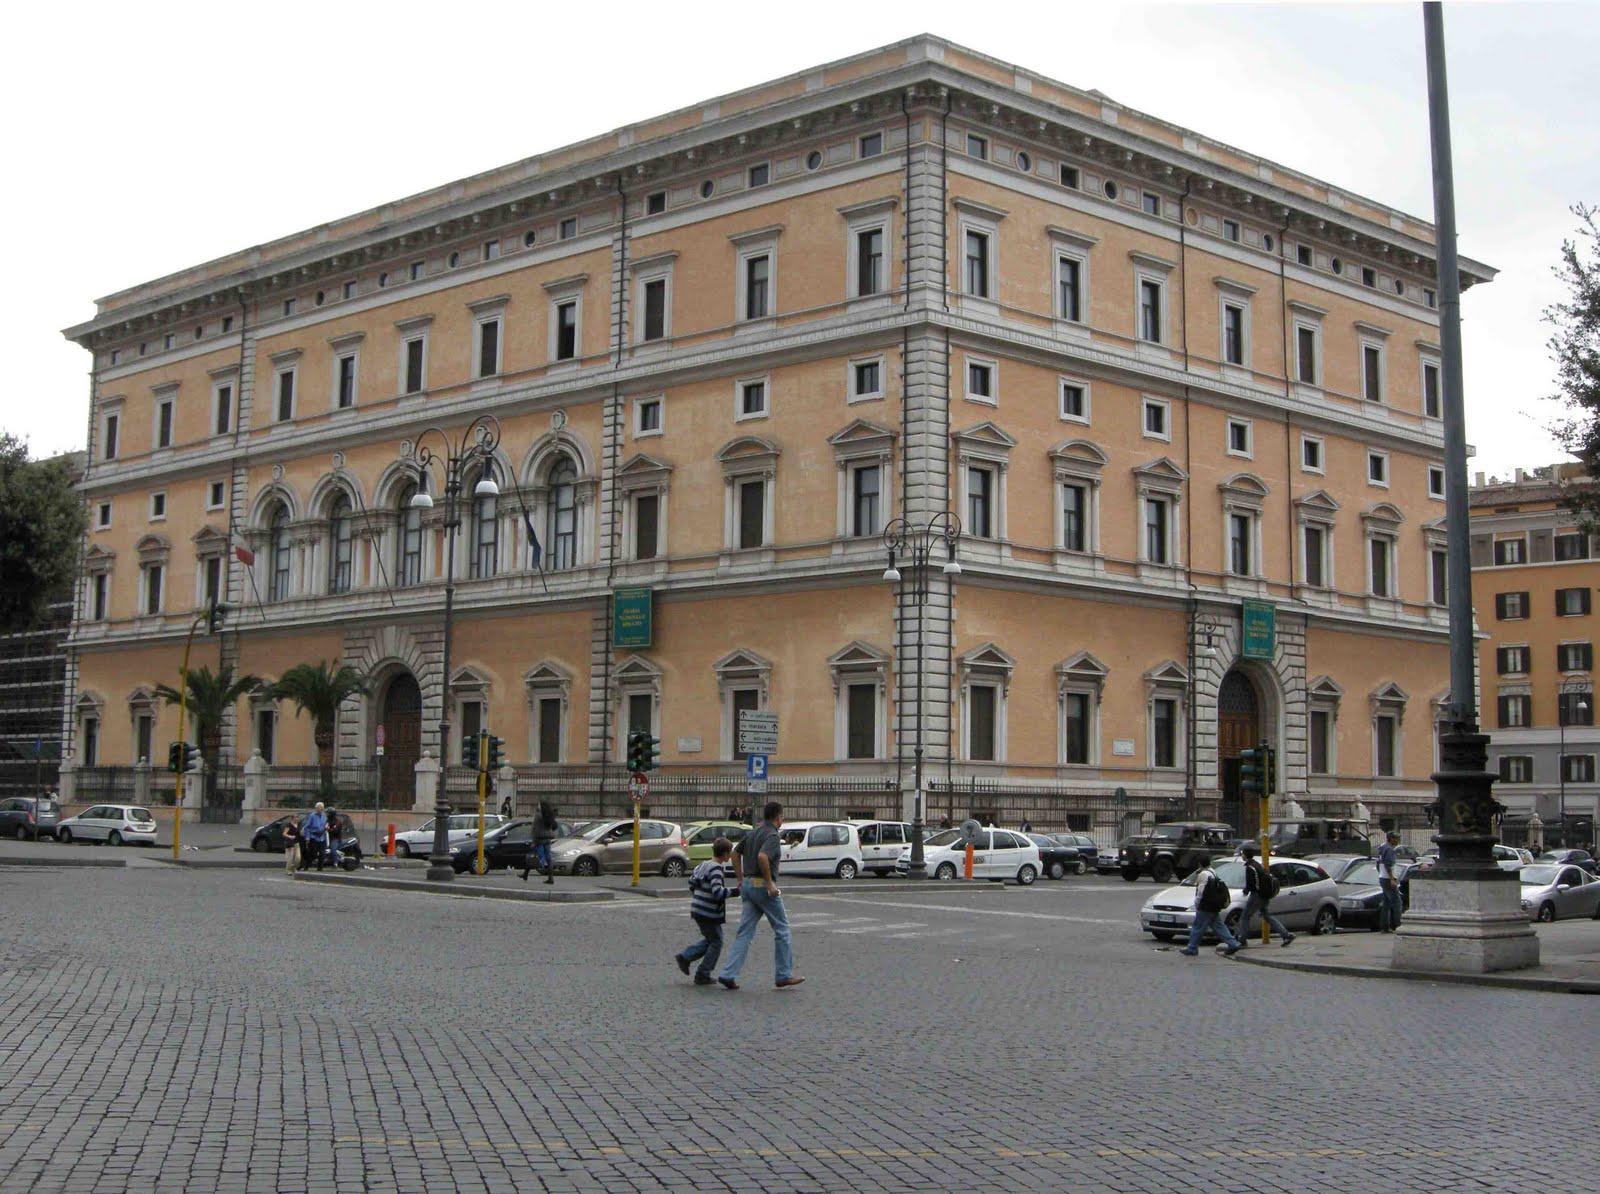 palazzo massimo essay Posts about museo nazionale romano di palazzo massimo written by giacobbe giusti.